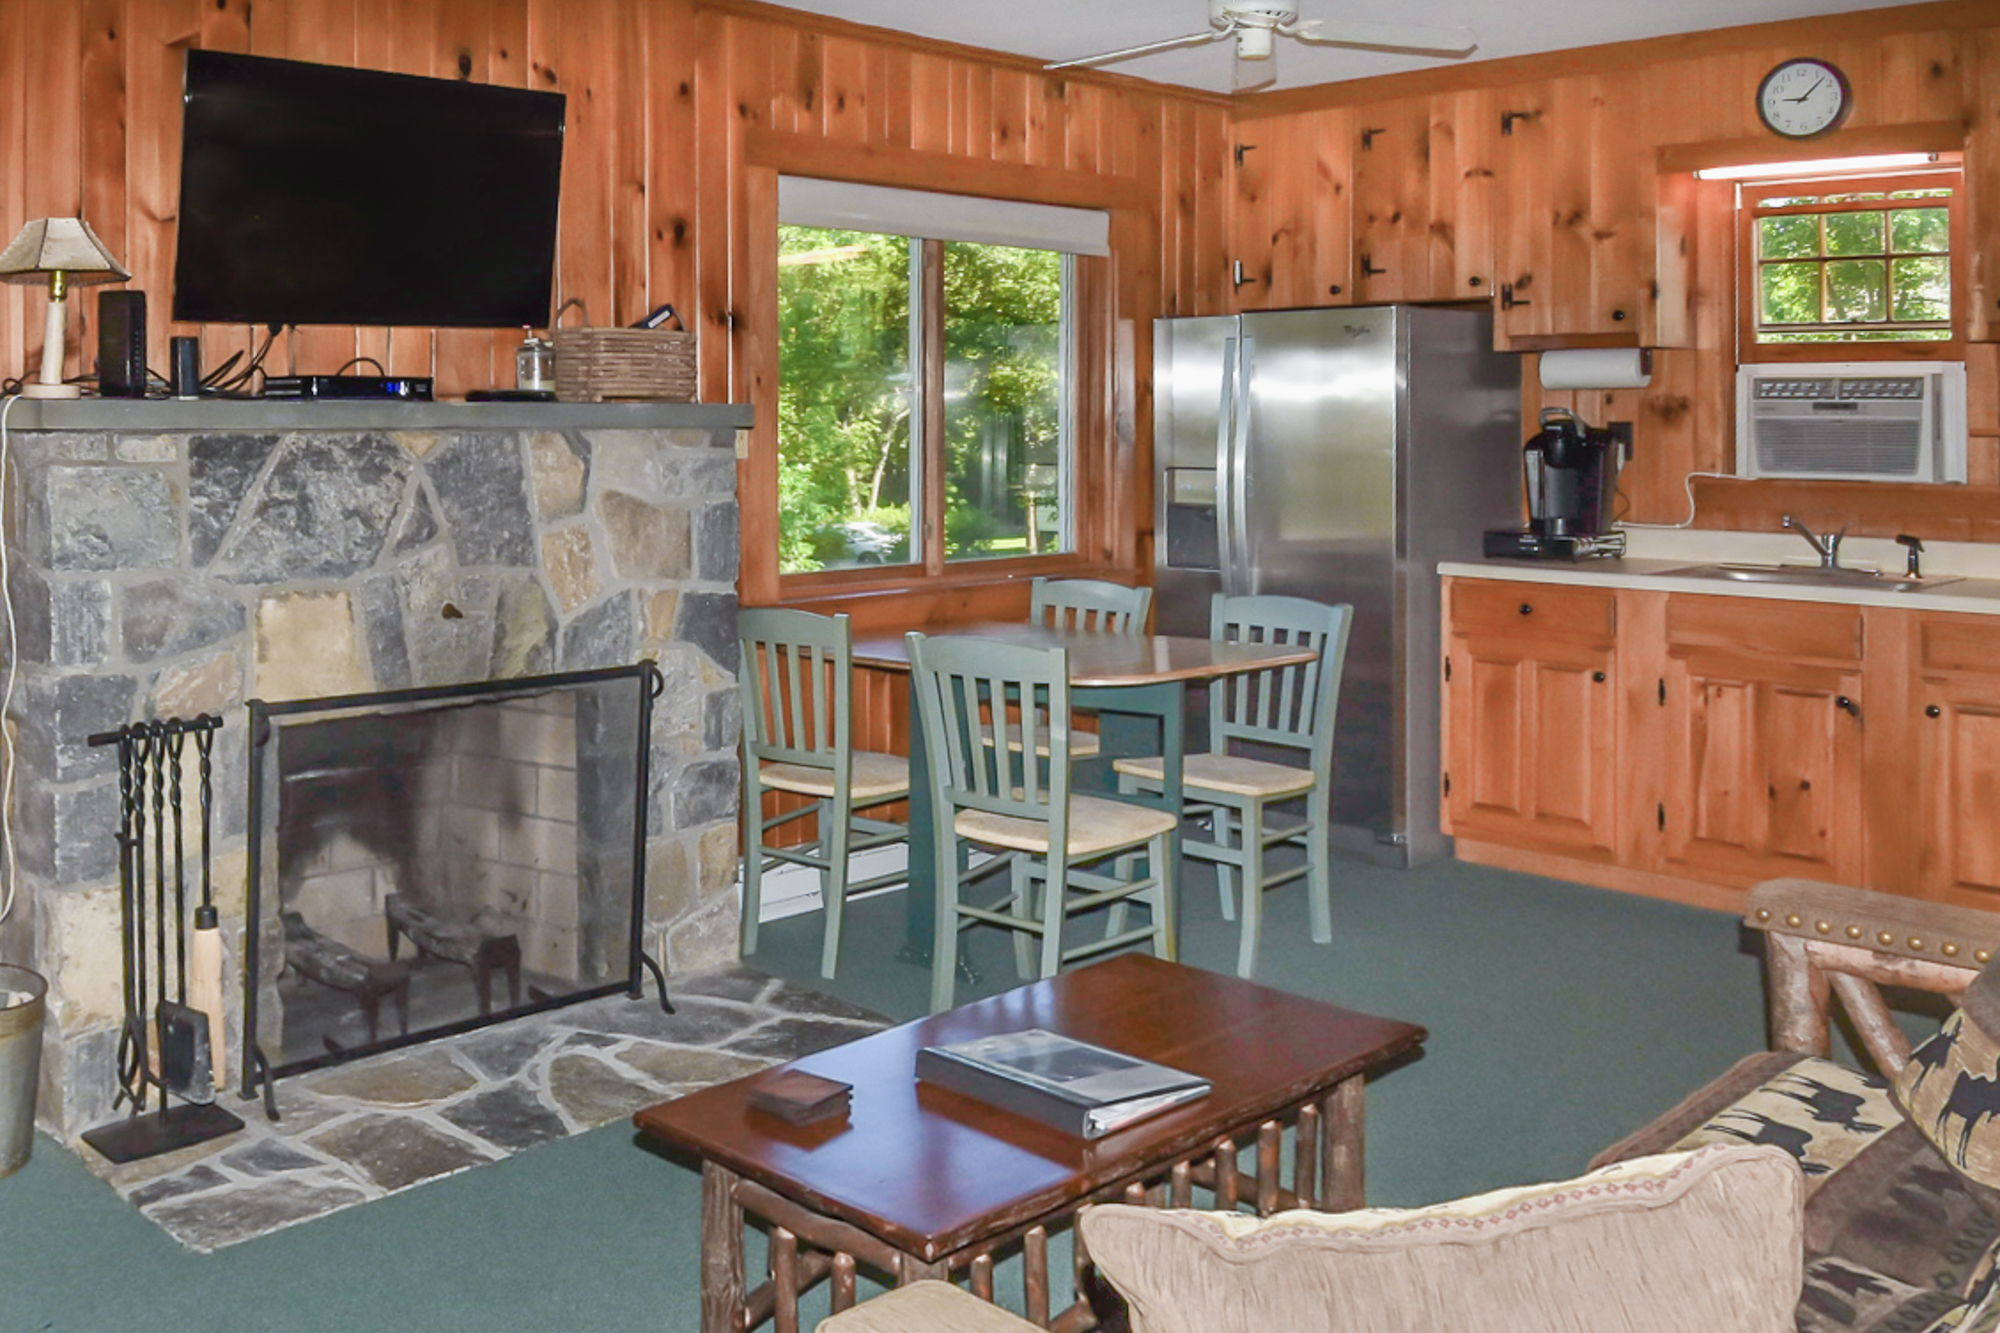 Takundewide Cottage #22LivRoomJul2019DSC_1363-2